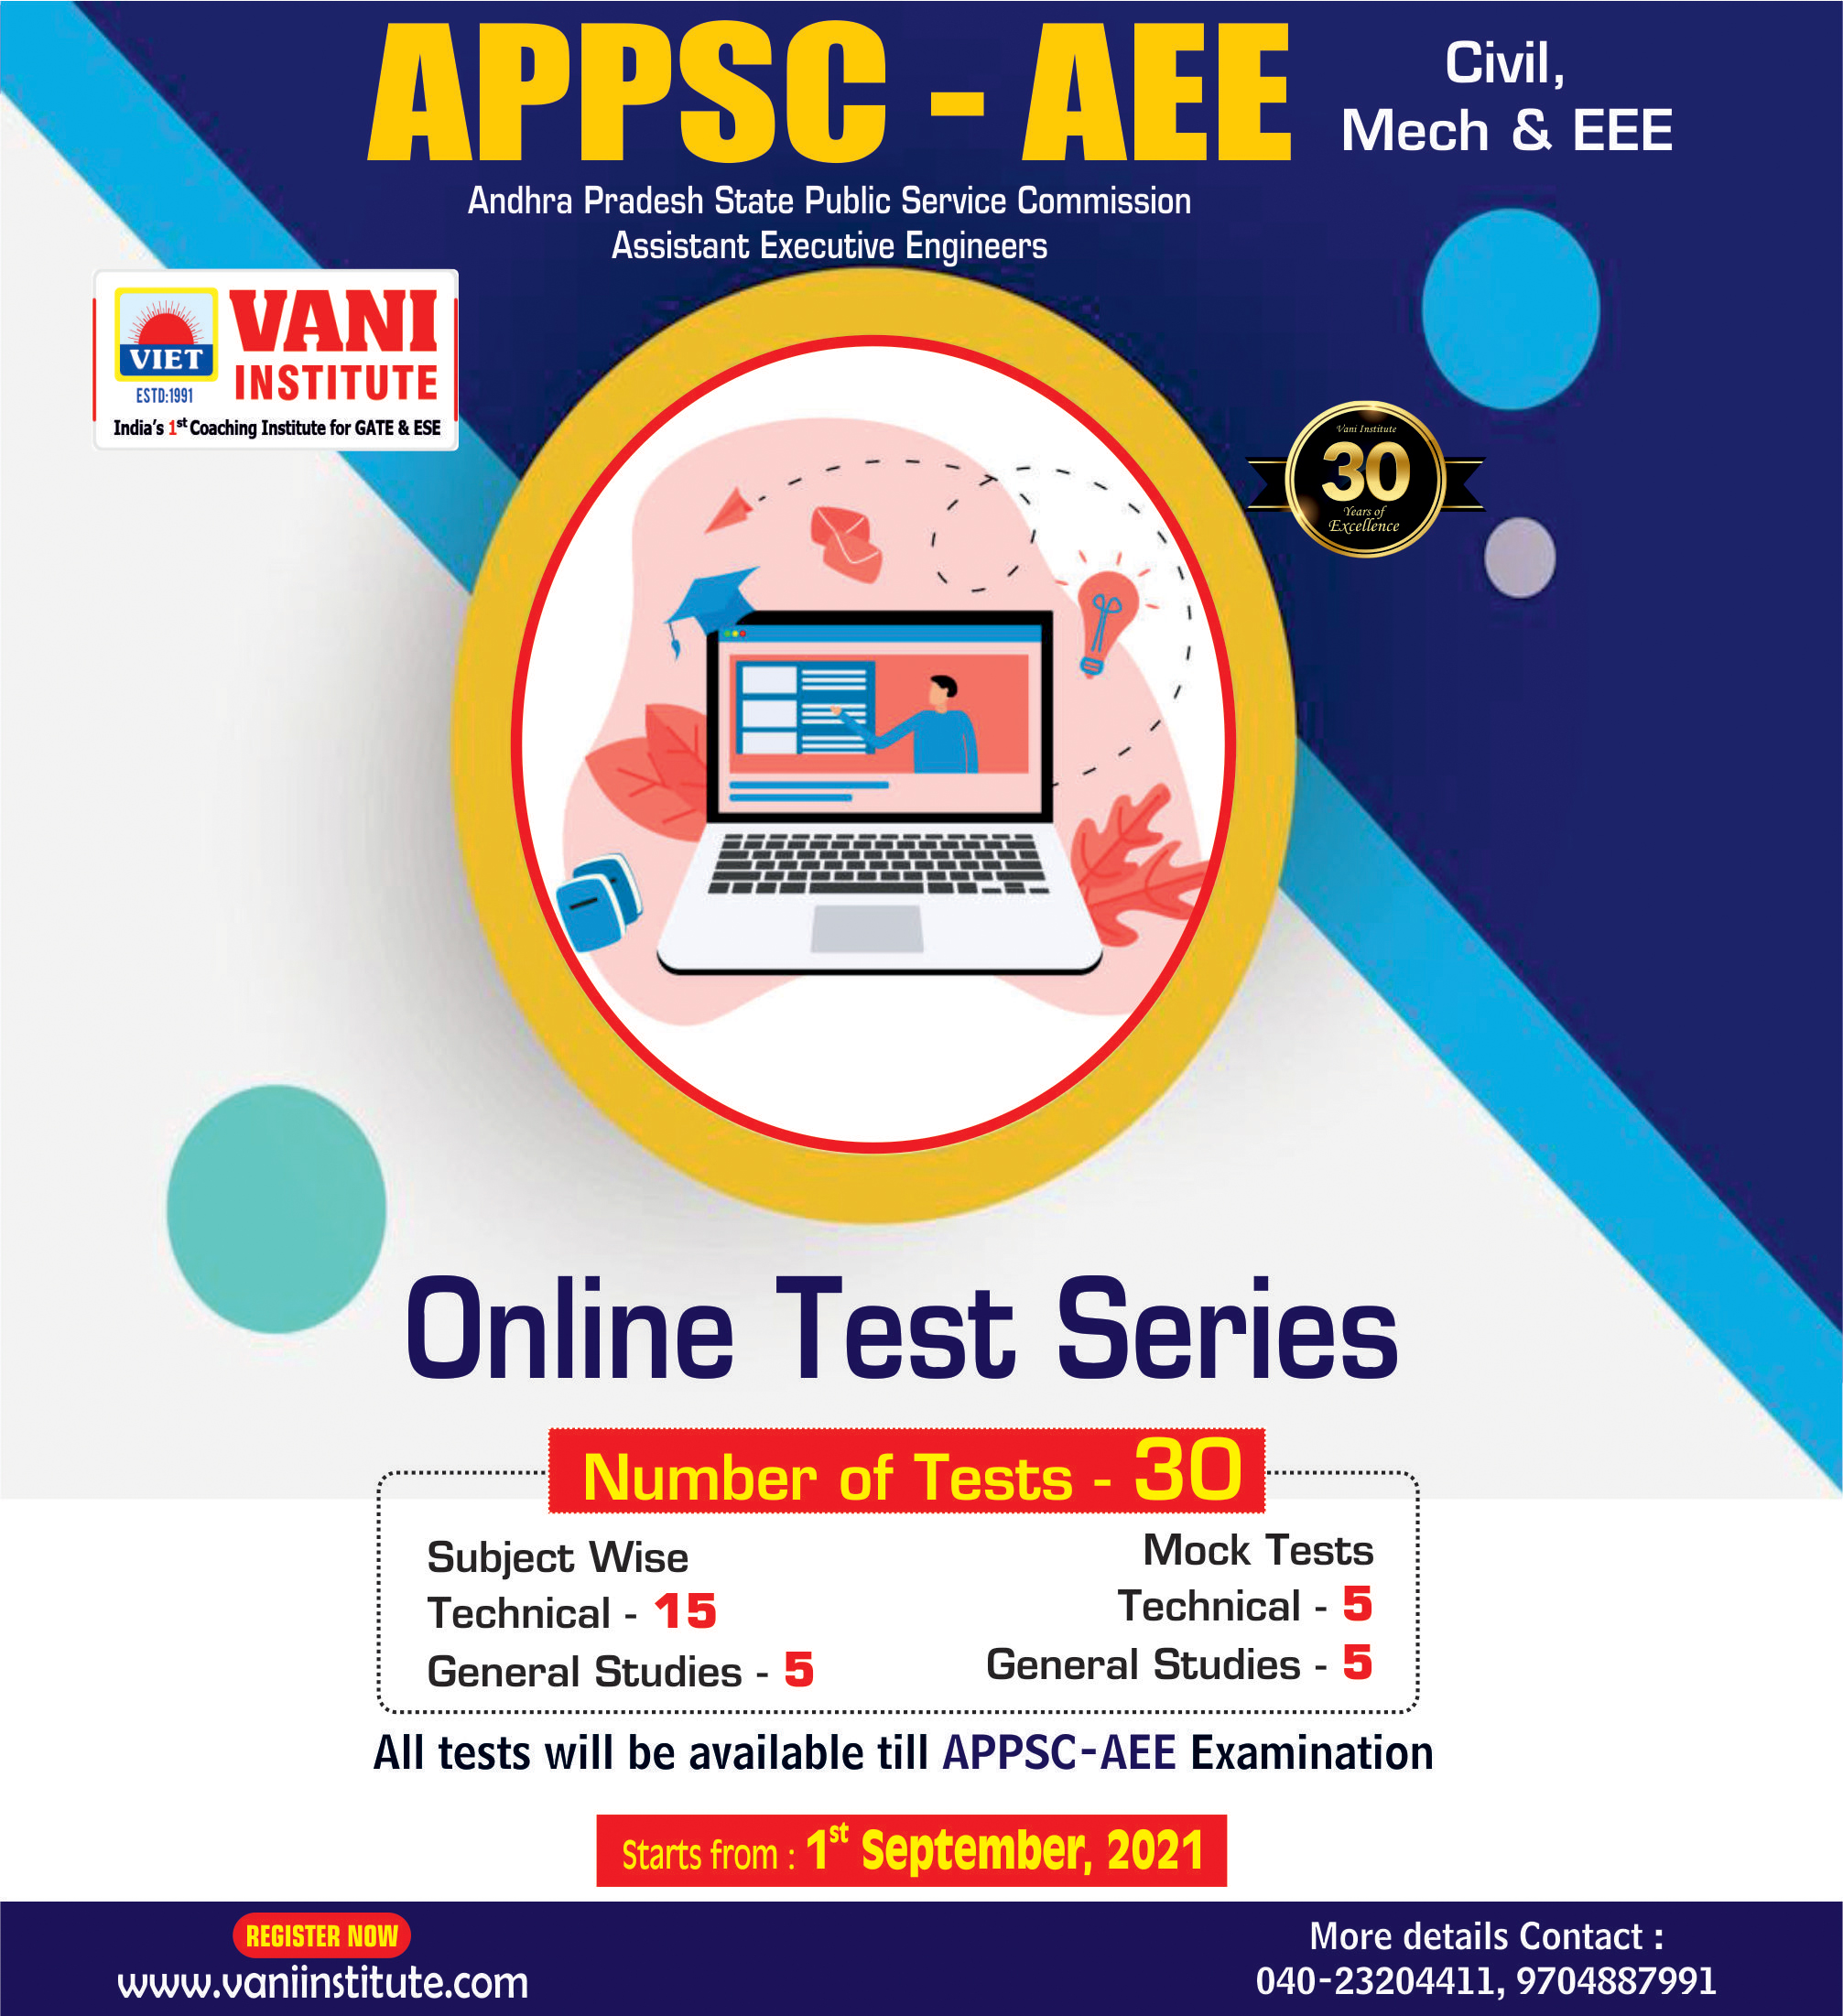 APPSC-AEE ONLINE TEST SERIES